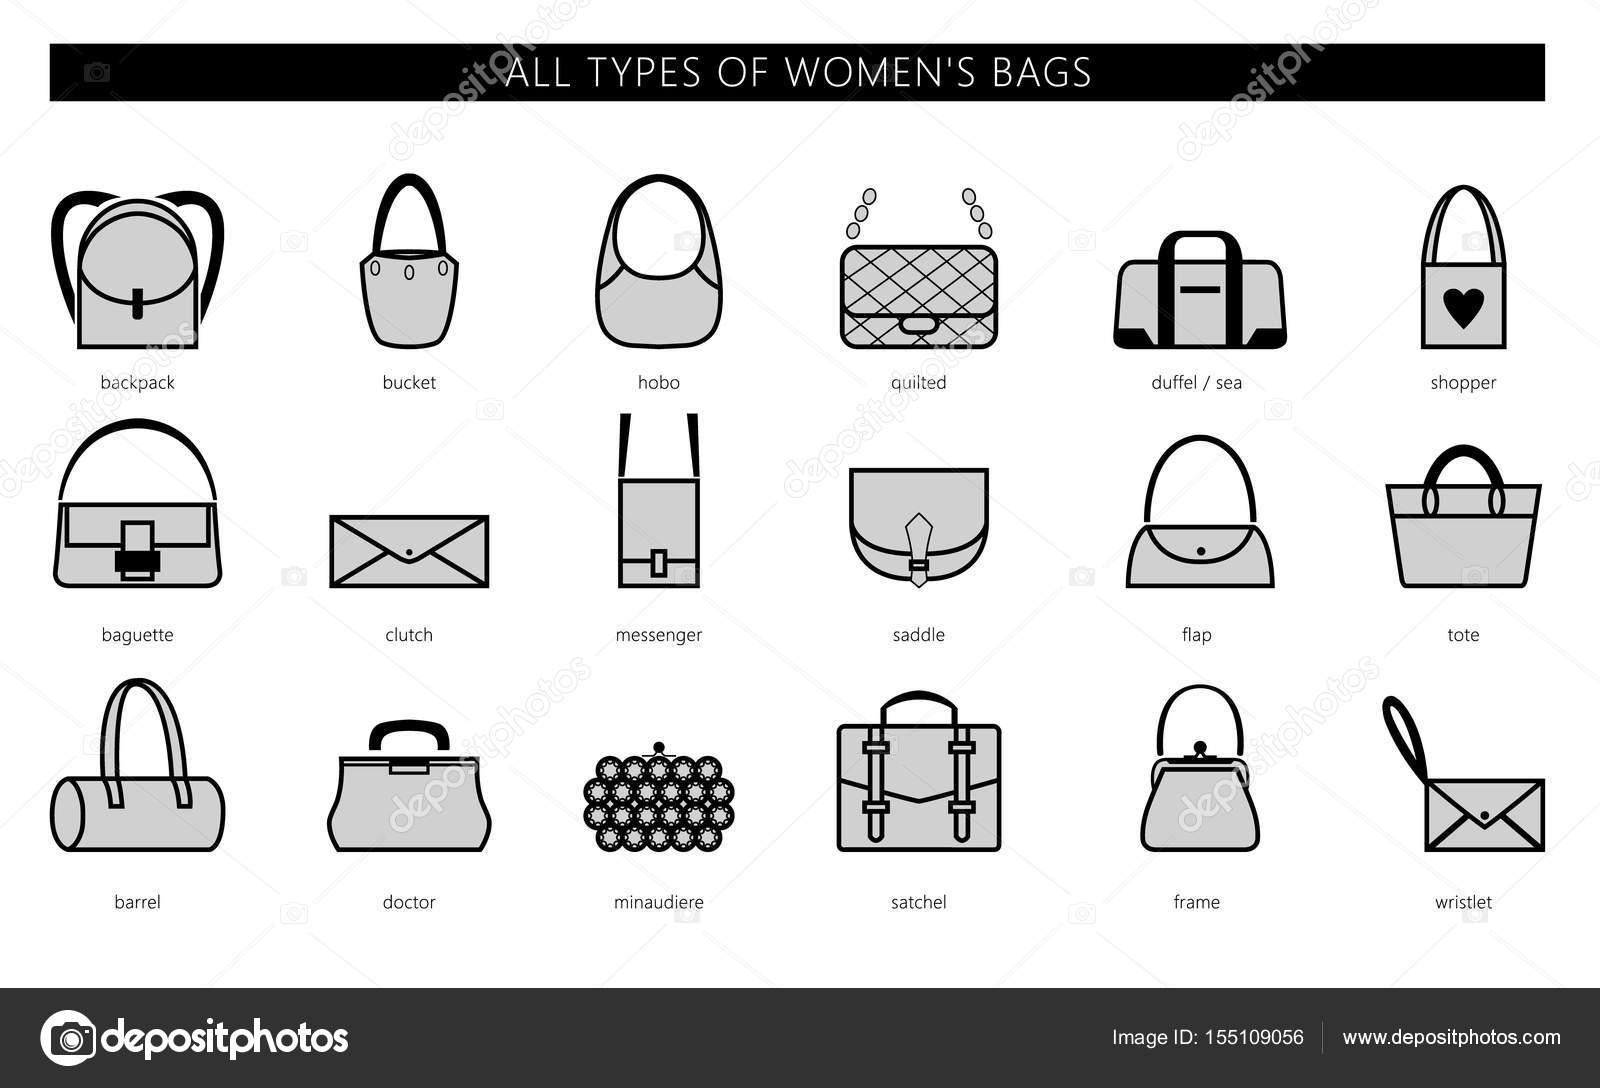 soorten tassen